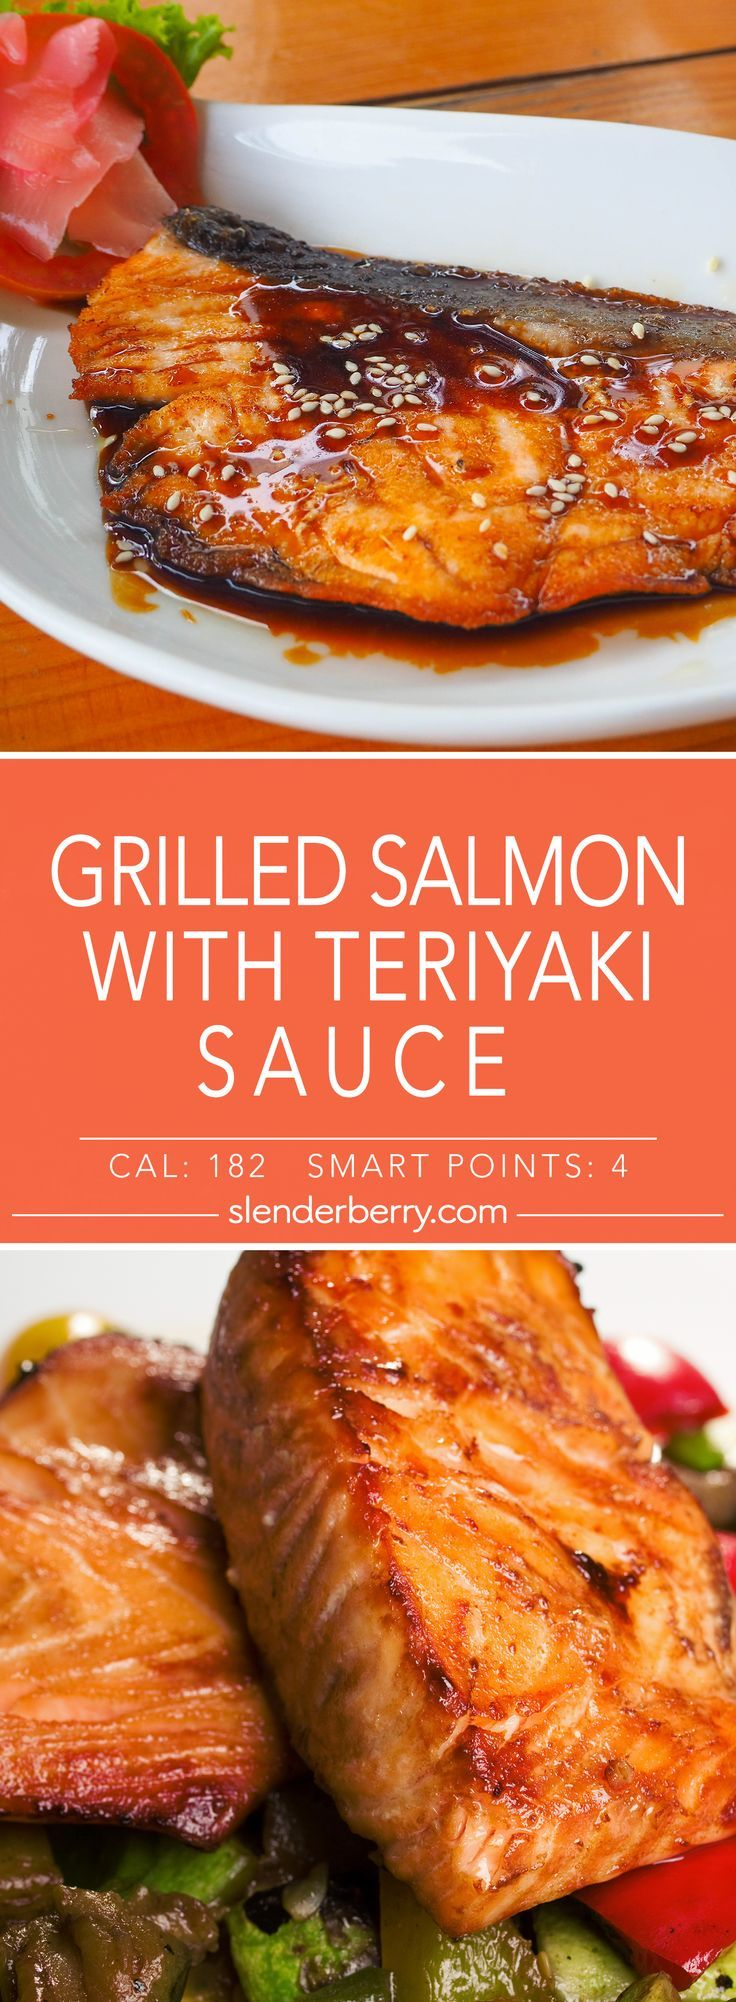 Grilled Teriyaki Salmon - Slenderberry